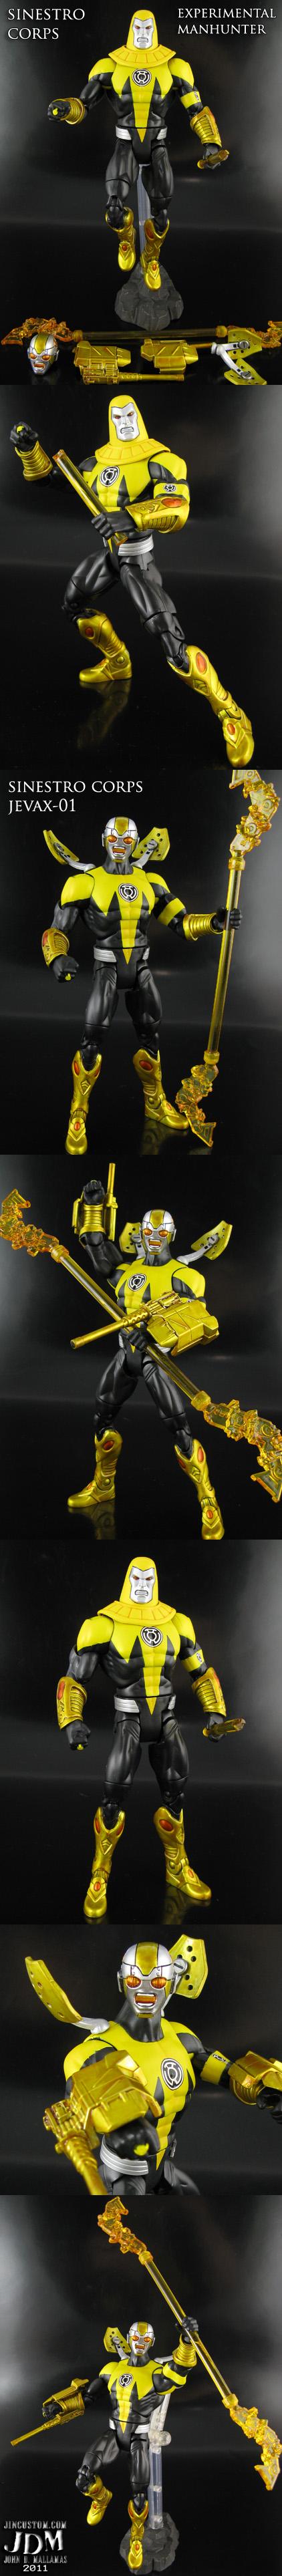 Custom Sinestro Corps